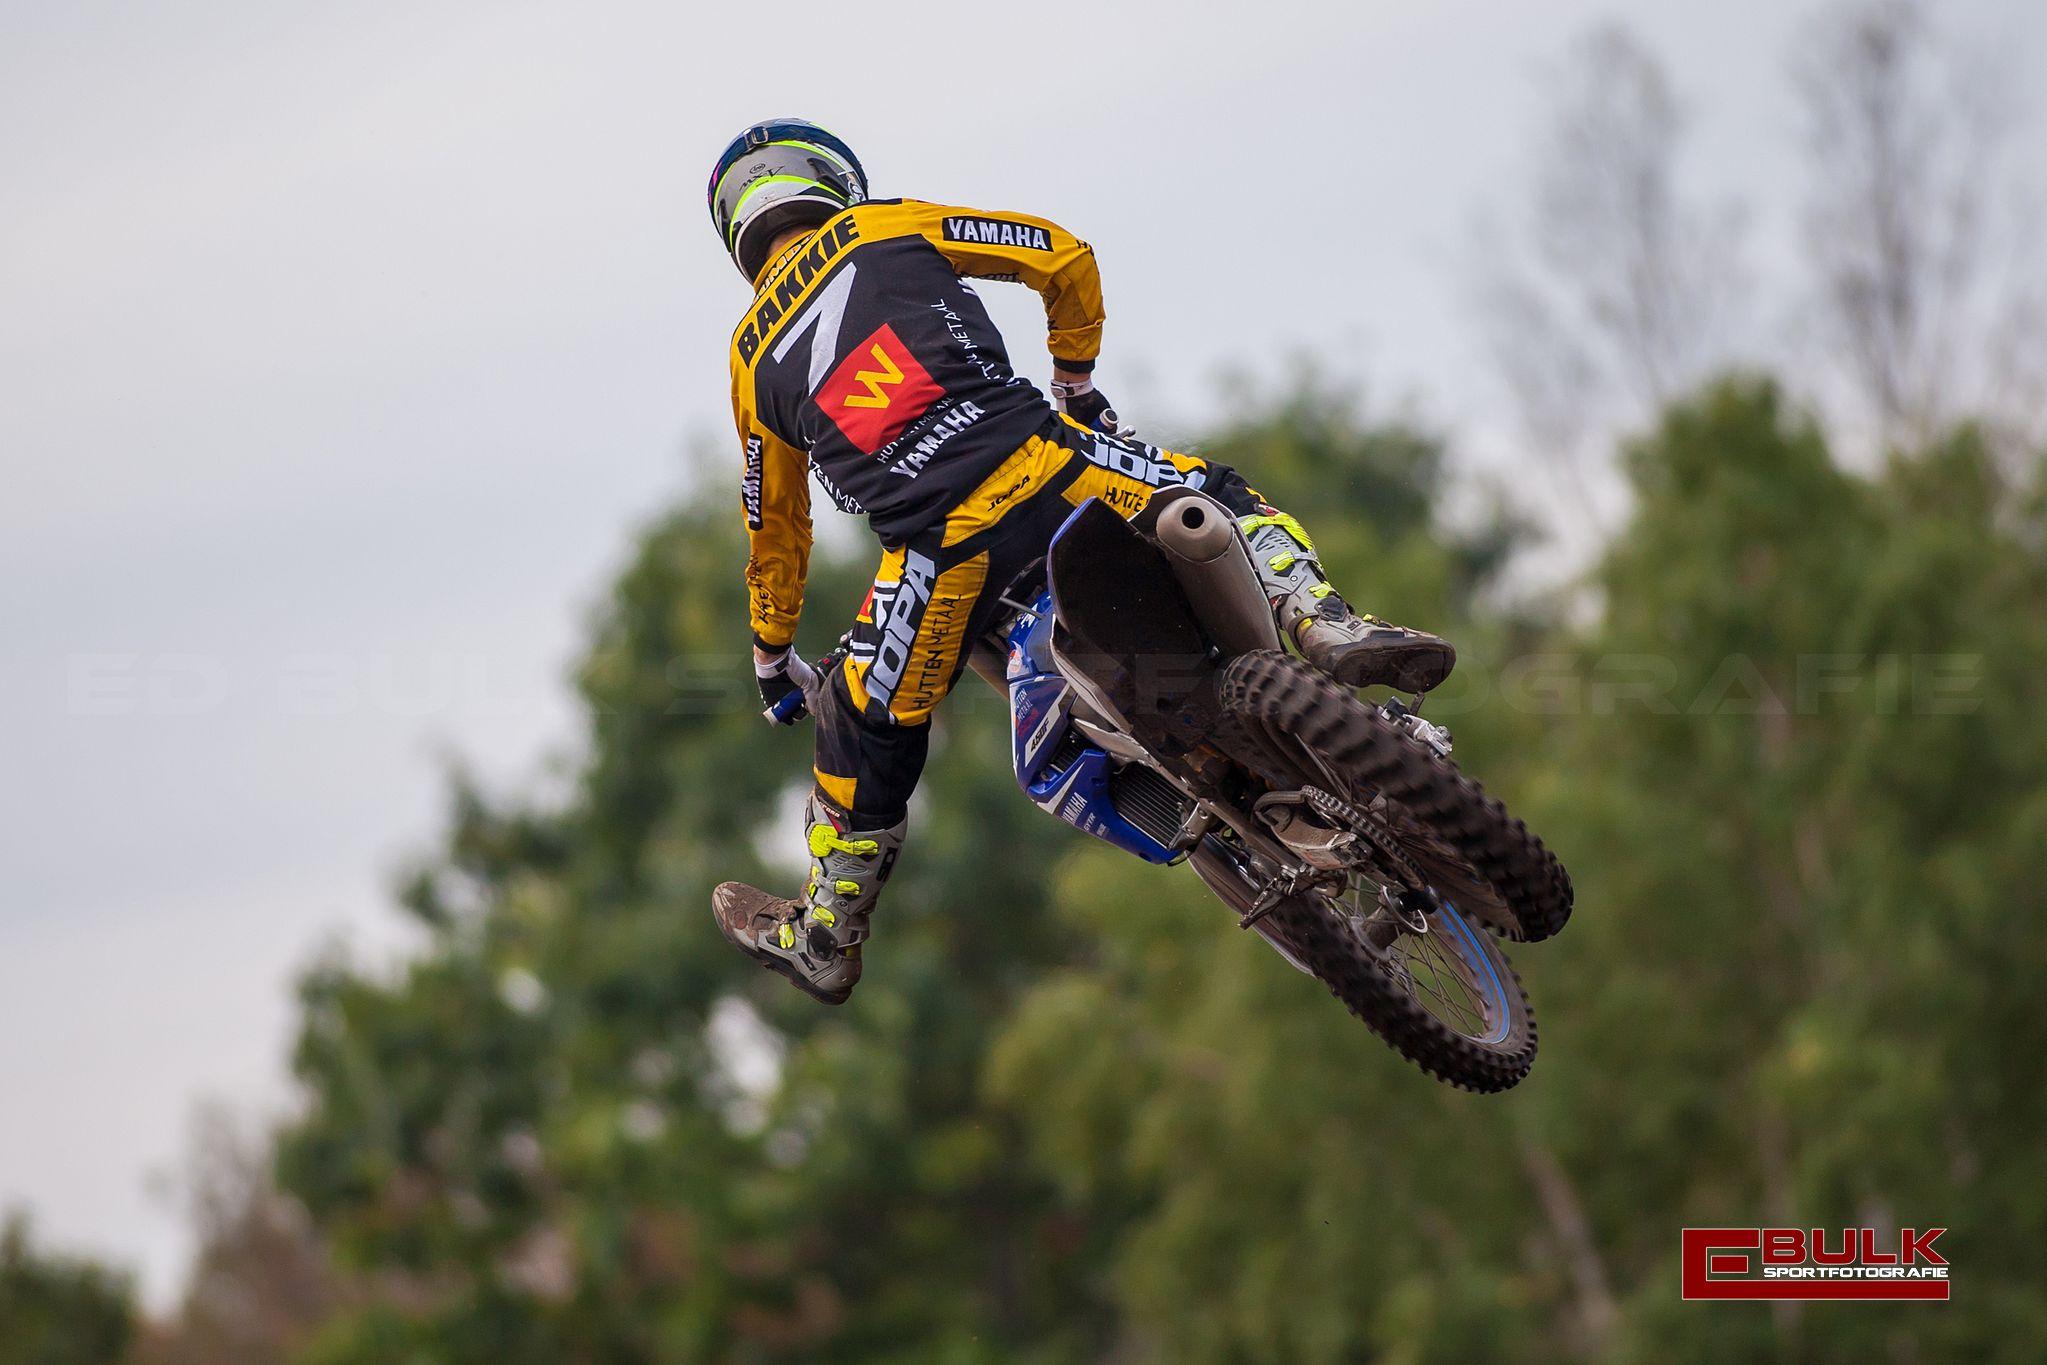 ebs_0053-ed_bulk_sportfotografie